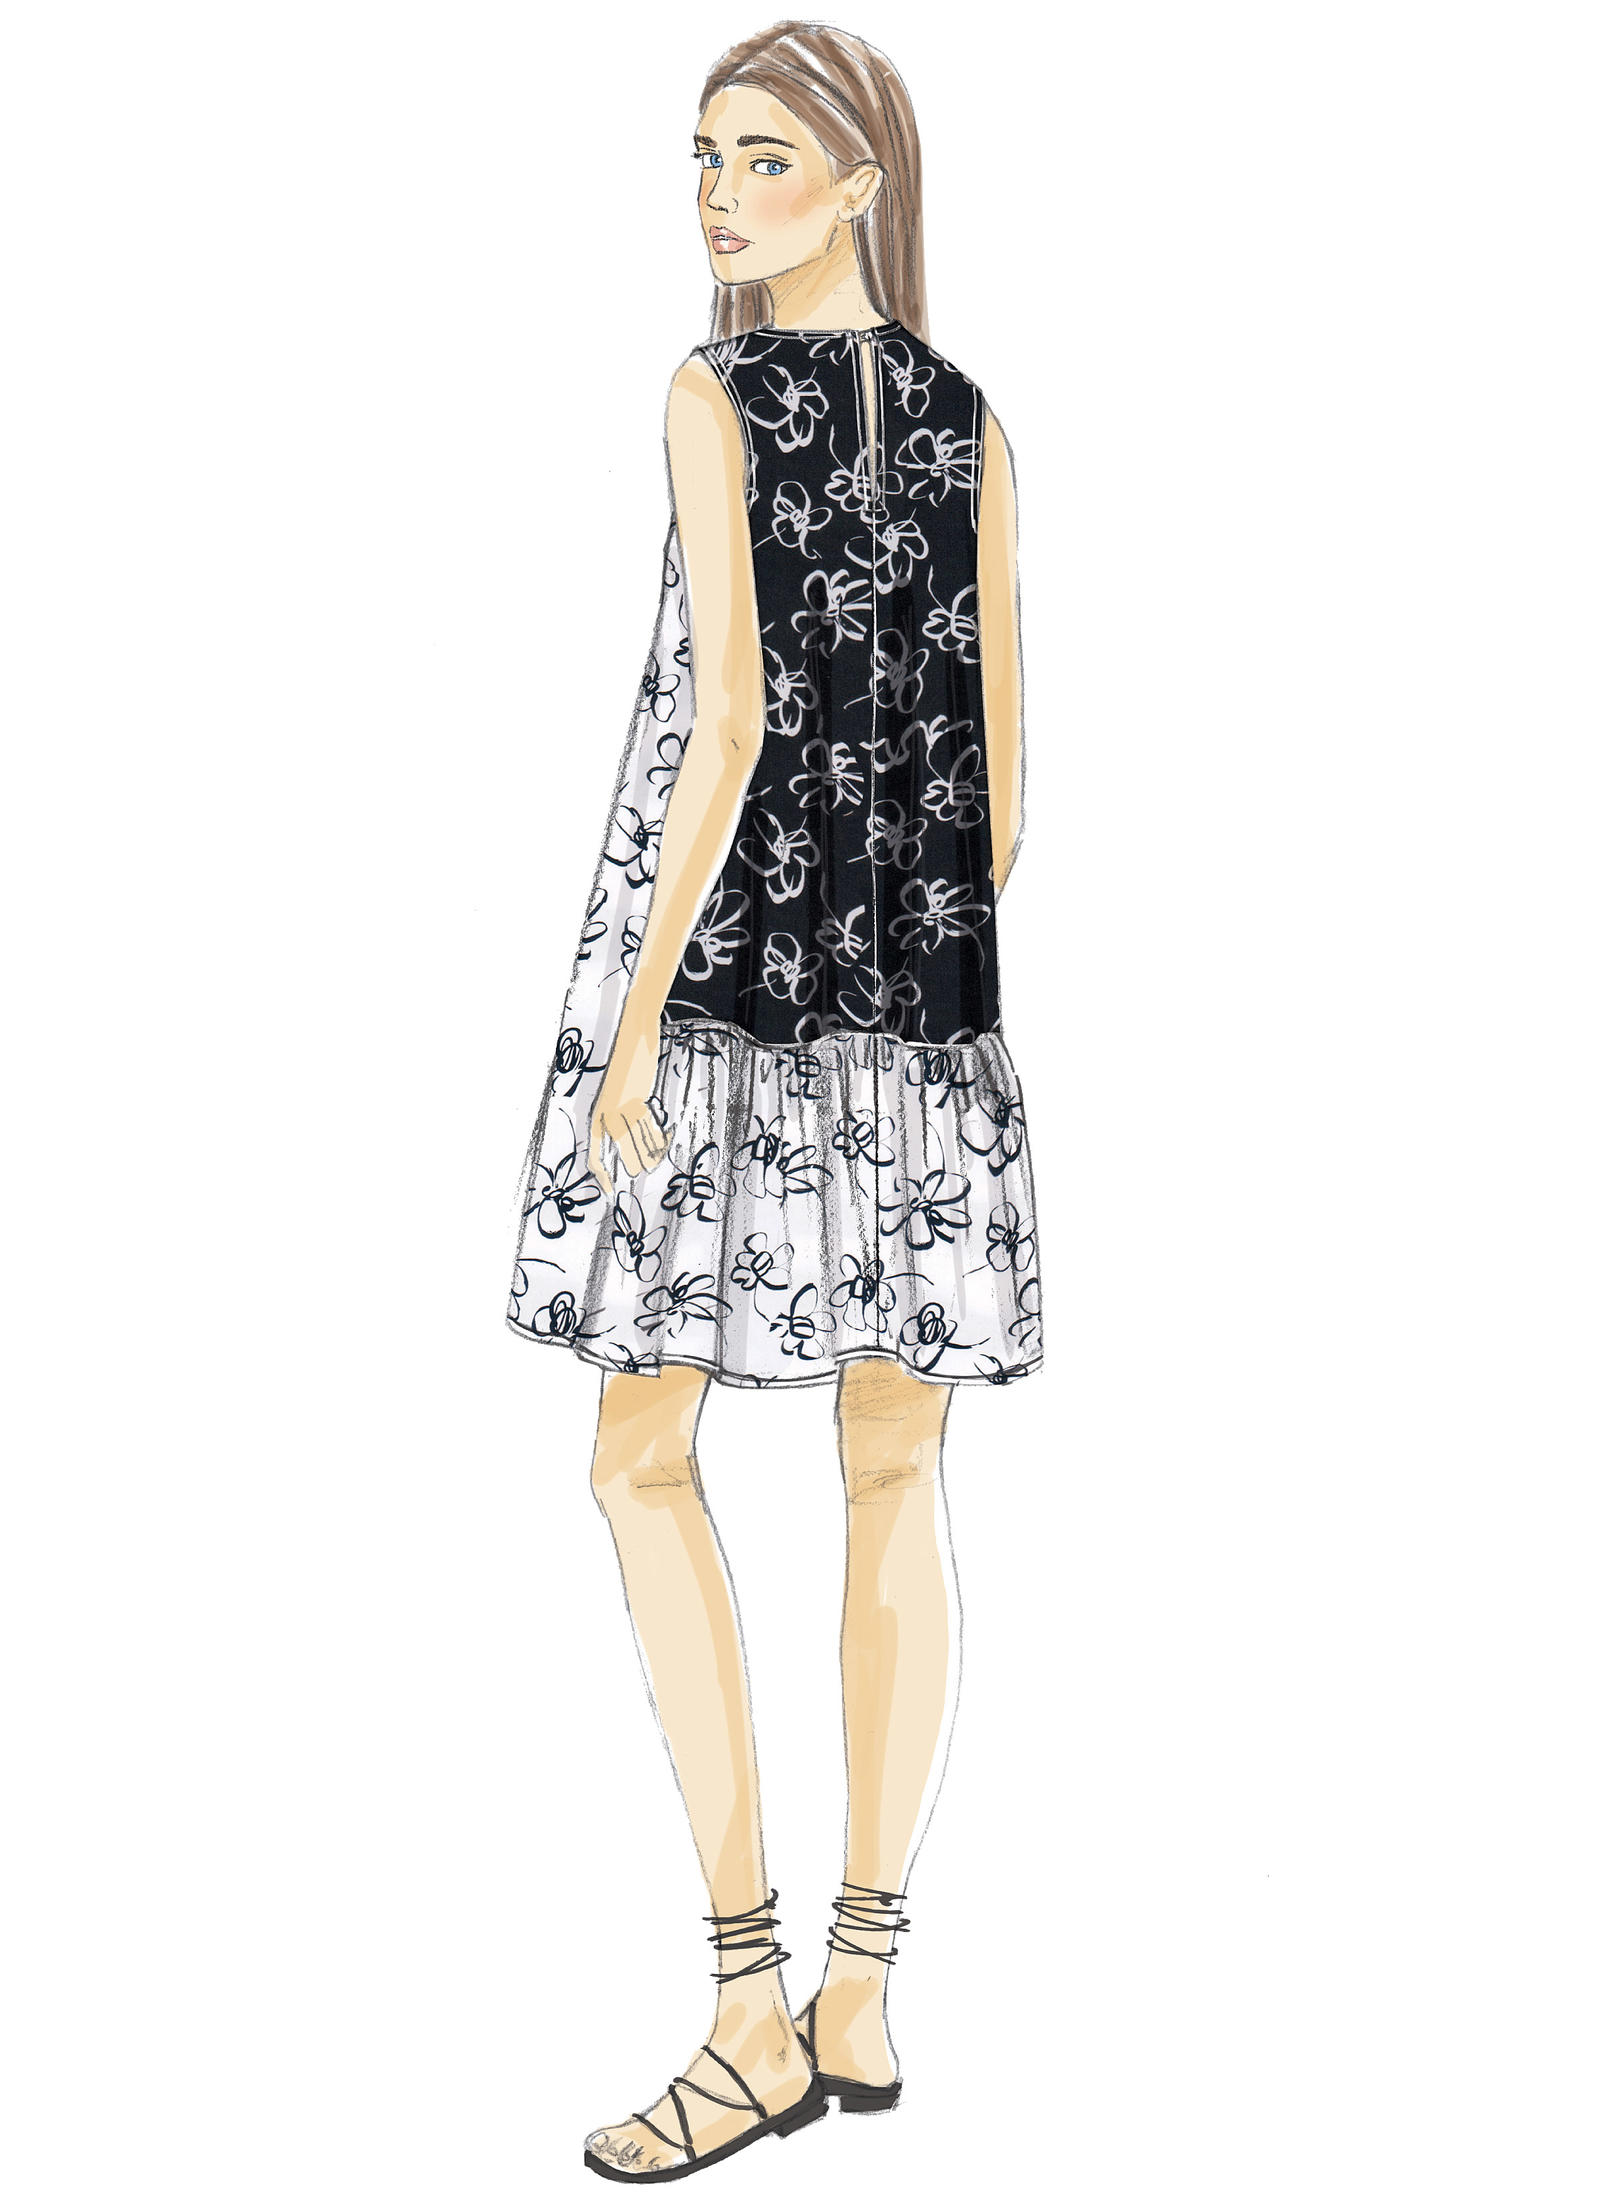 Vogue Patterns 9237 MISSES' A-LINE, BACK-RUFFLE DRESSES